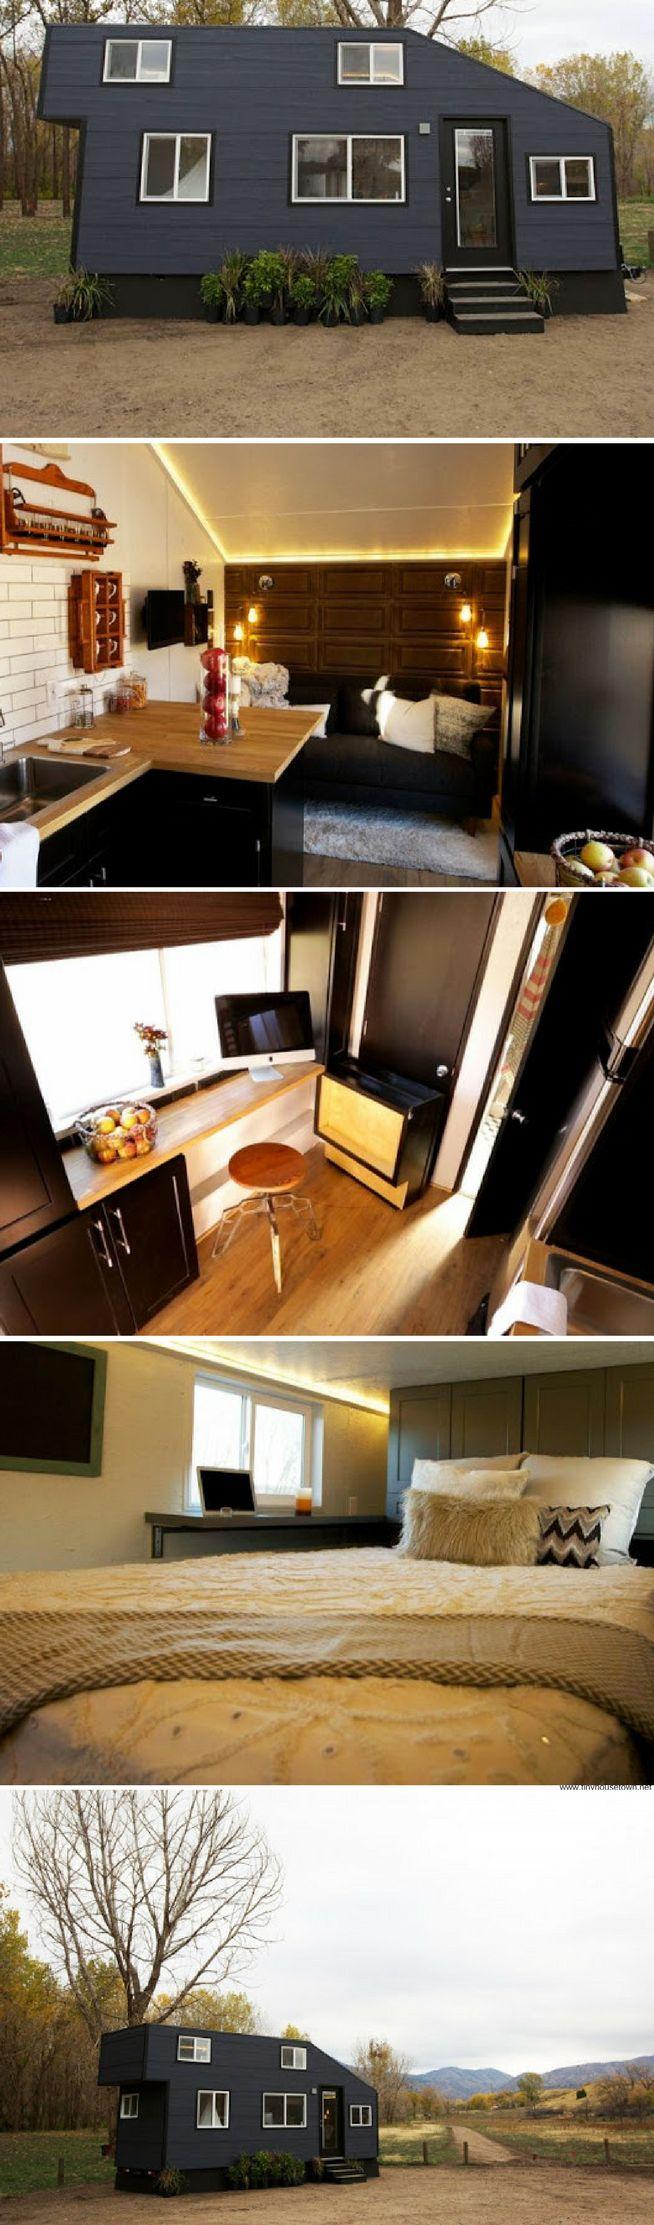 Contemporary tiny home from Tiny House Nation (200 sq ft)